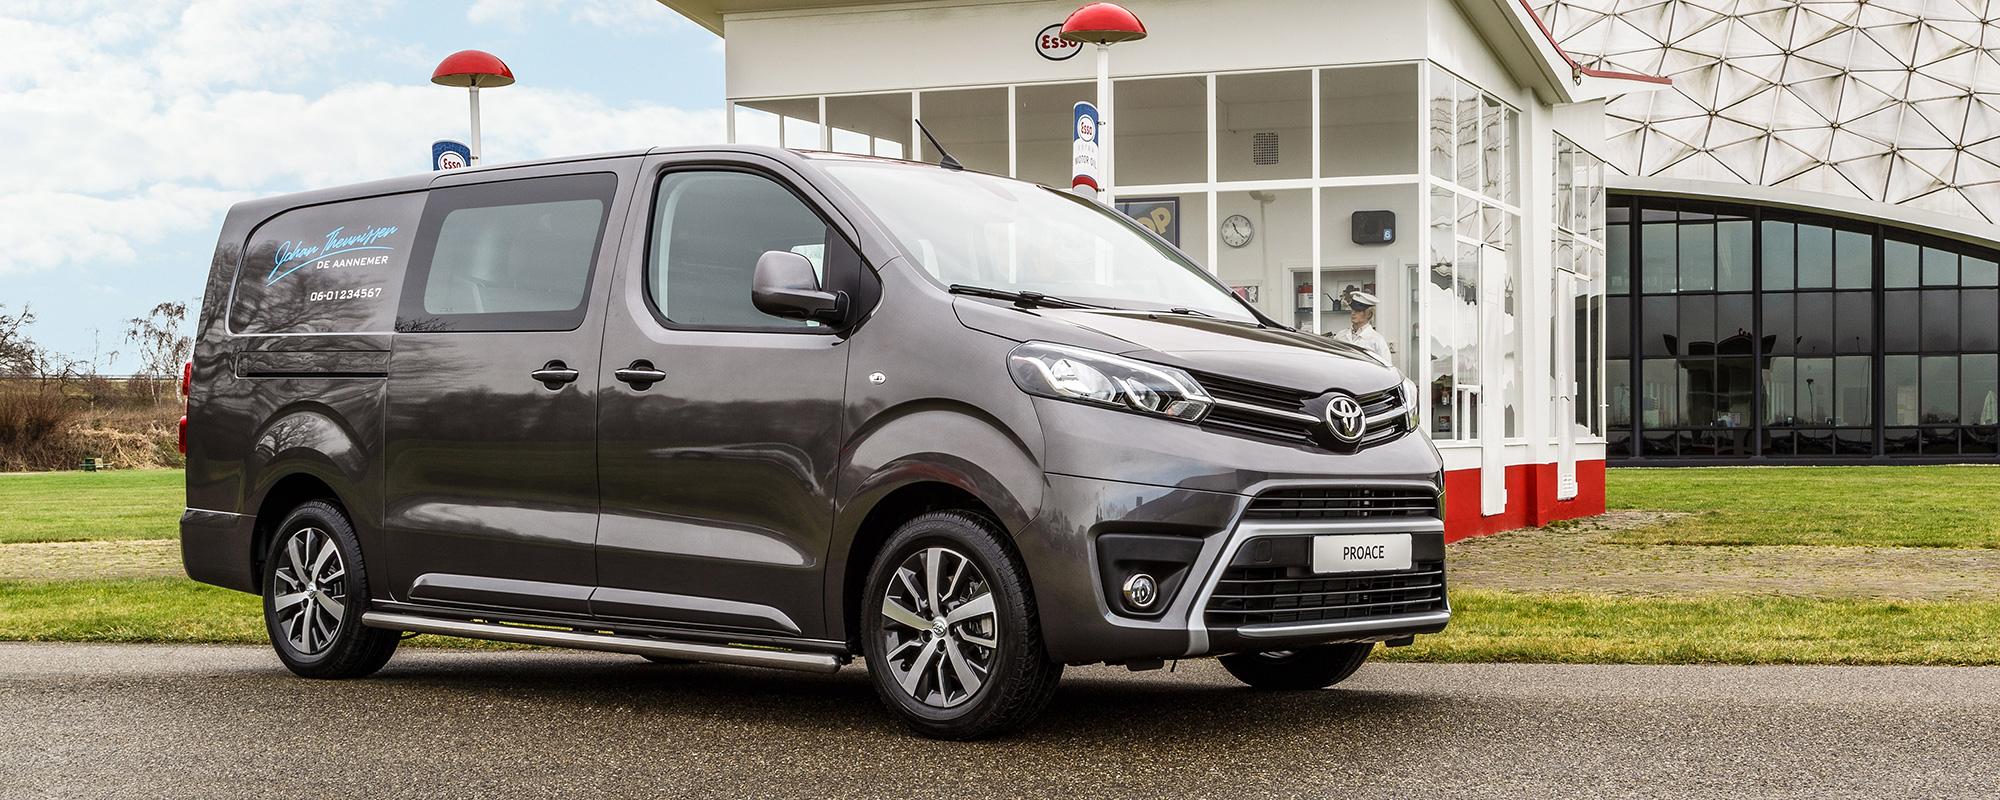 Toyota PROACE Dubbele Cabine onthuld op Bouwbeurs 2017